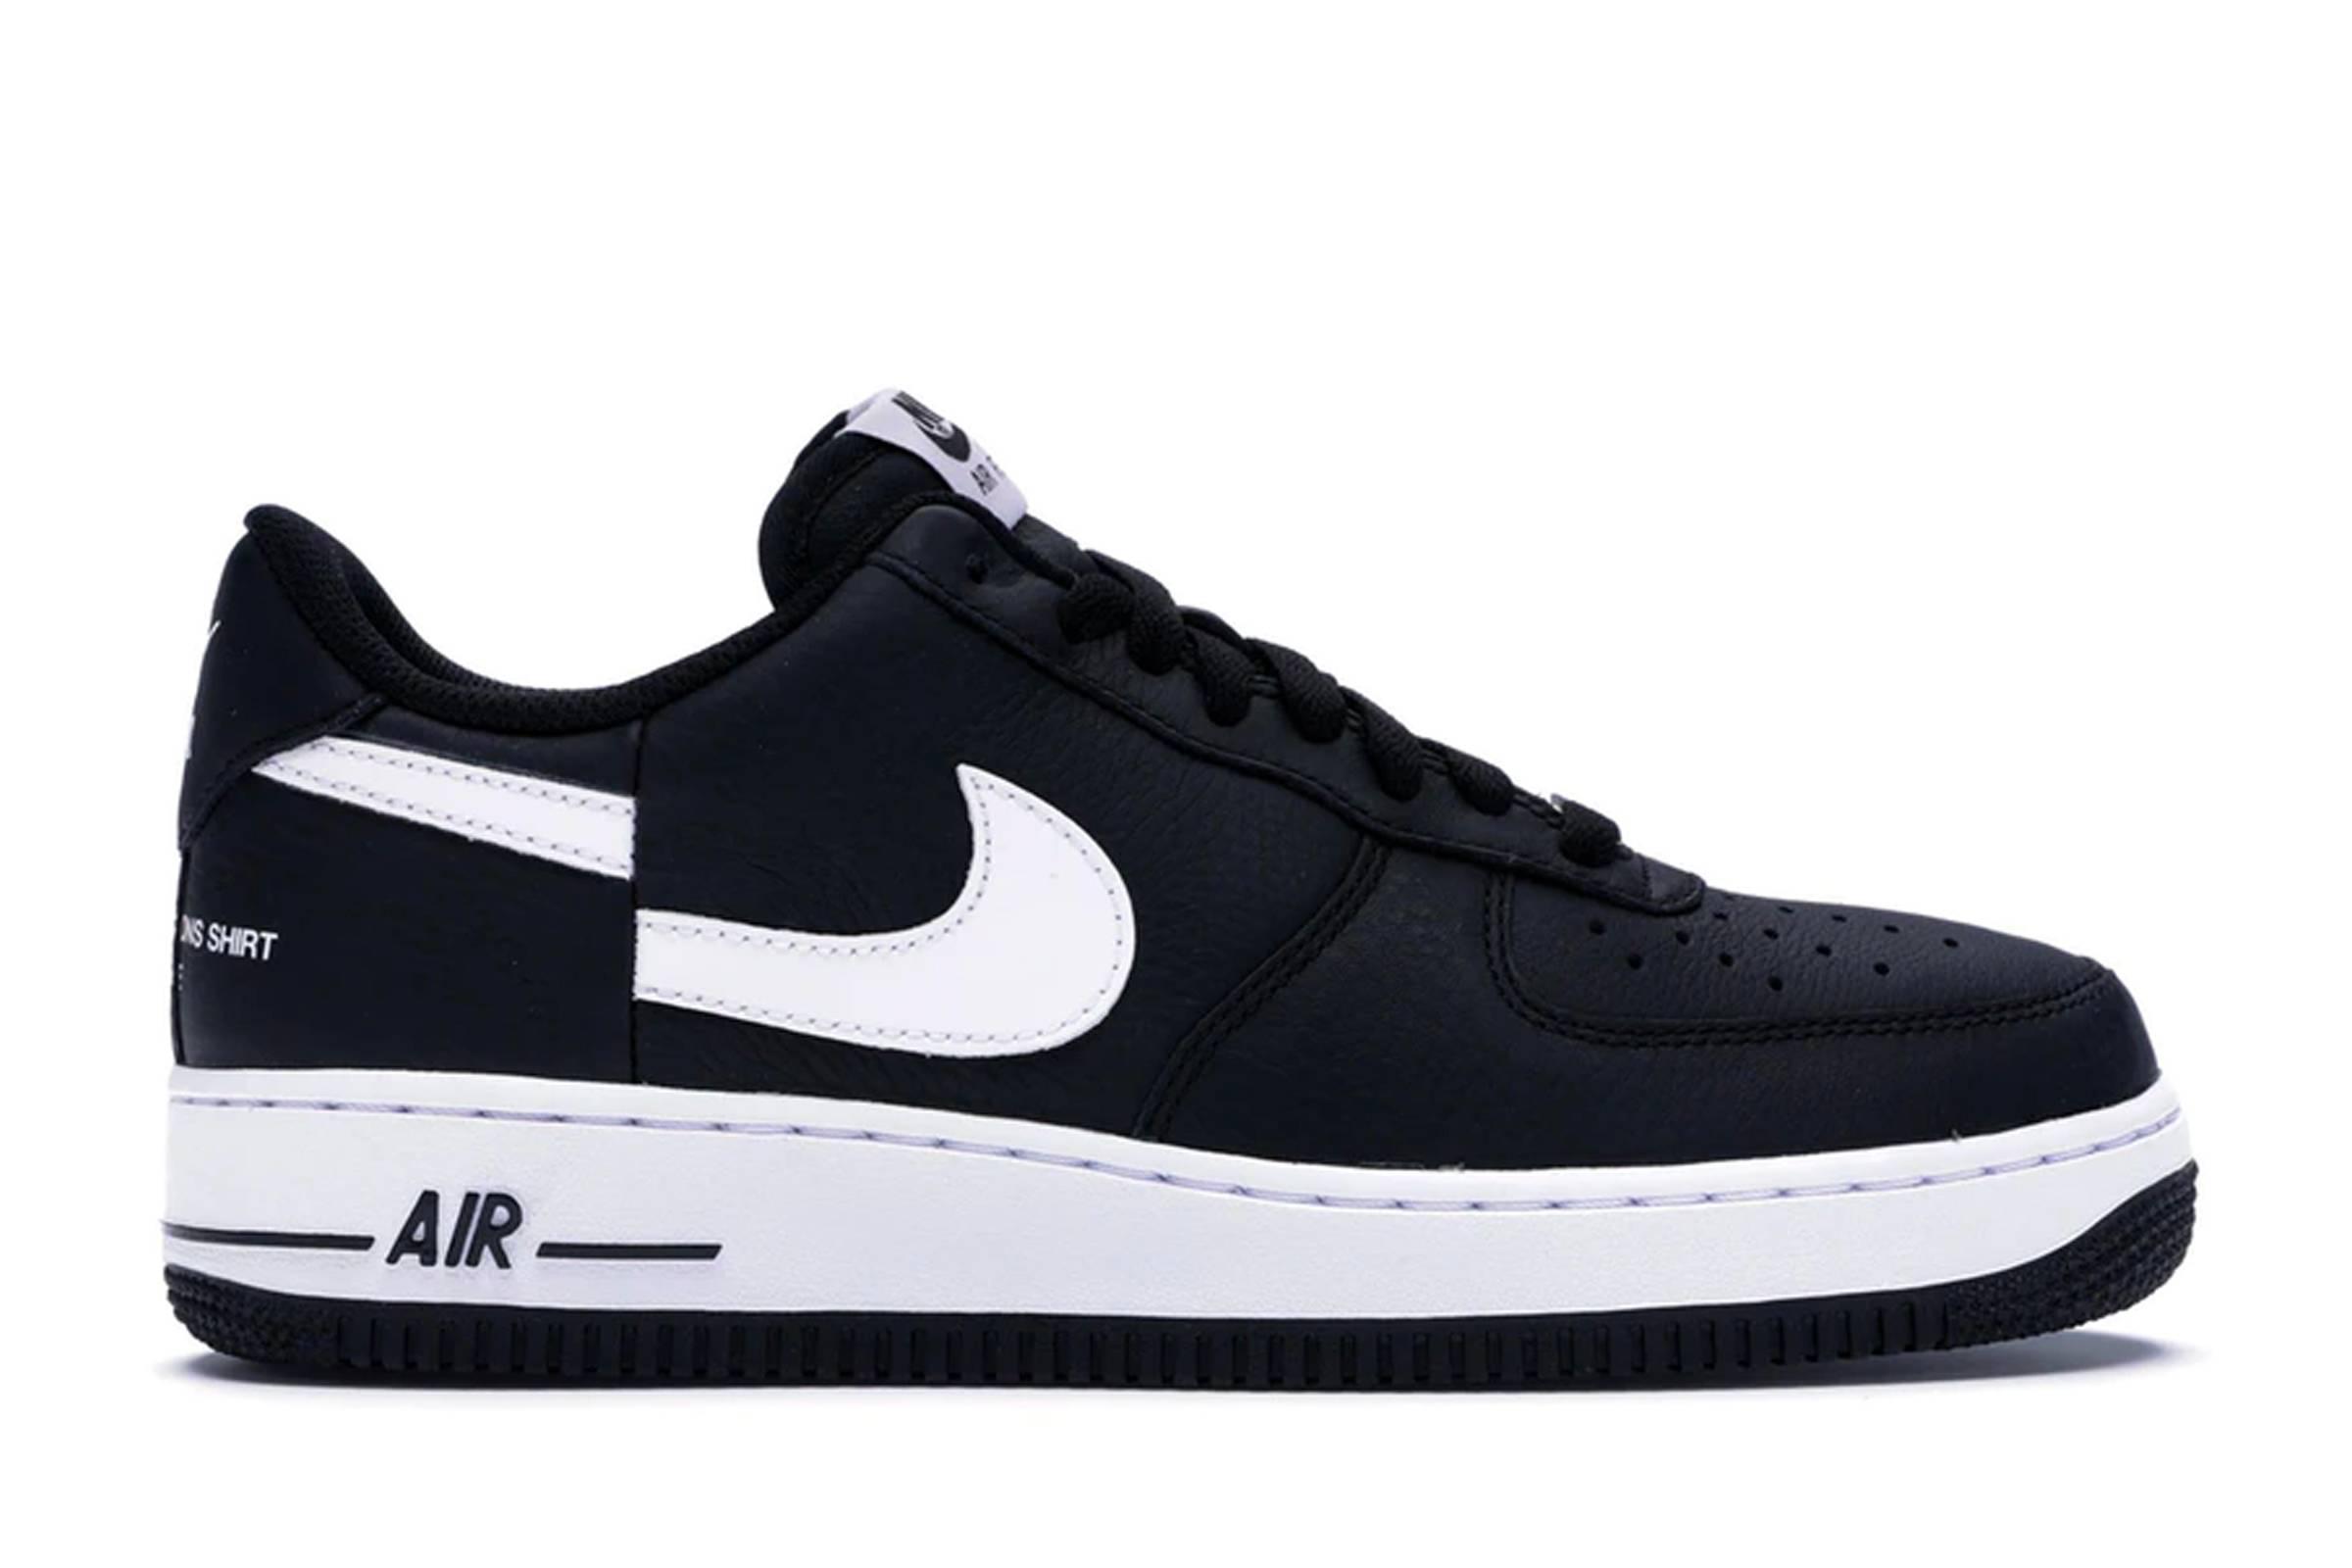 Comme des Garçons SHIRT x Supreme x Nike Air Force 1